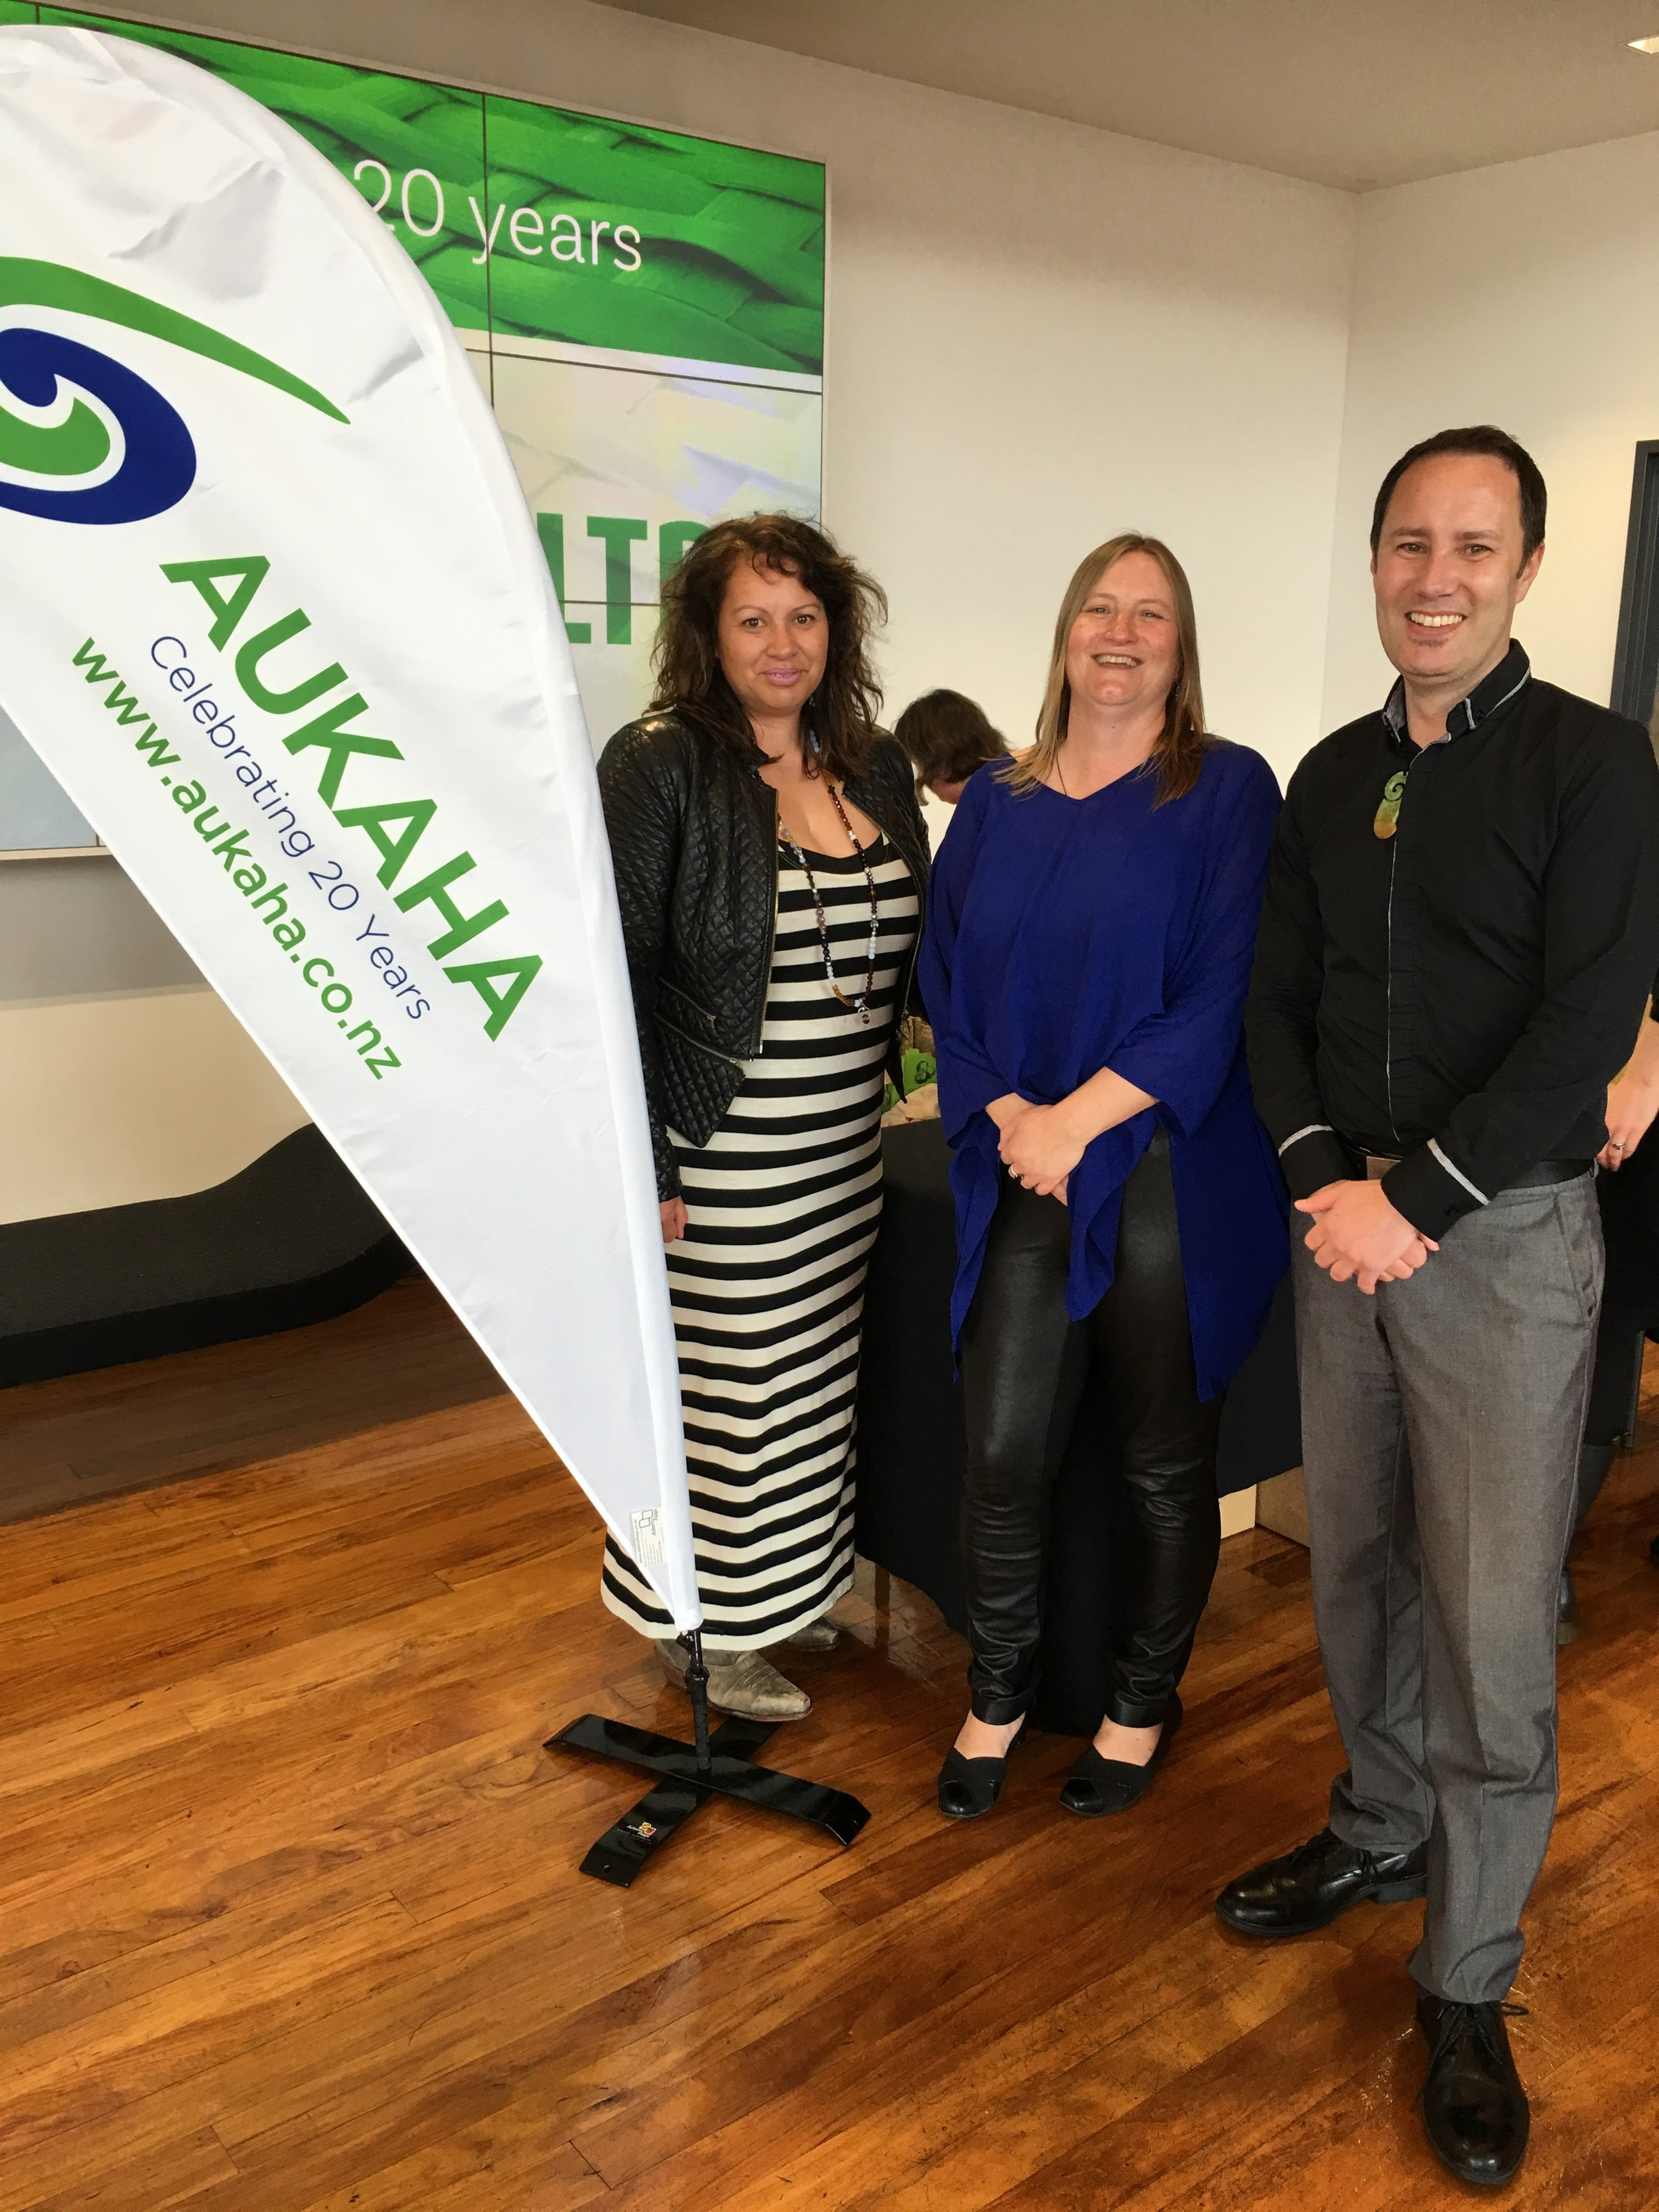 Kara Edwards and Maria Bartlett (Te Runanga o Ngai Tahu) with Chris Rosenbrock, General Manager KTKO